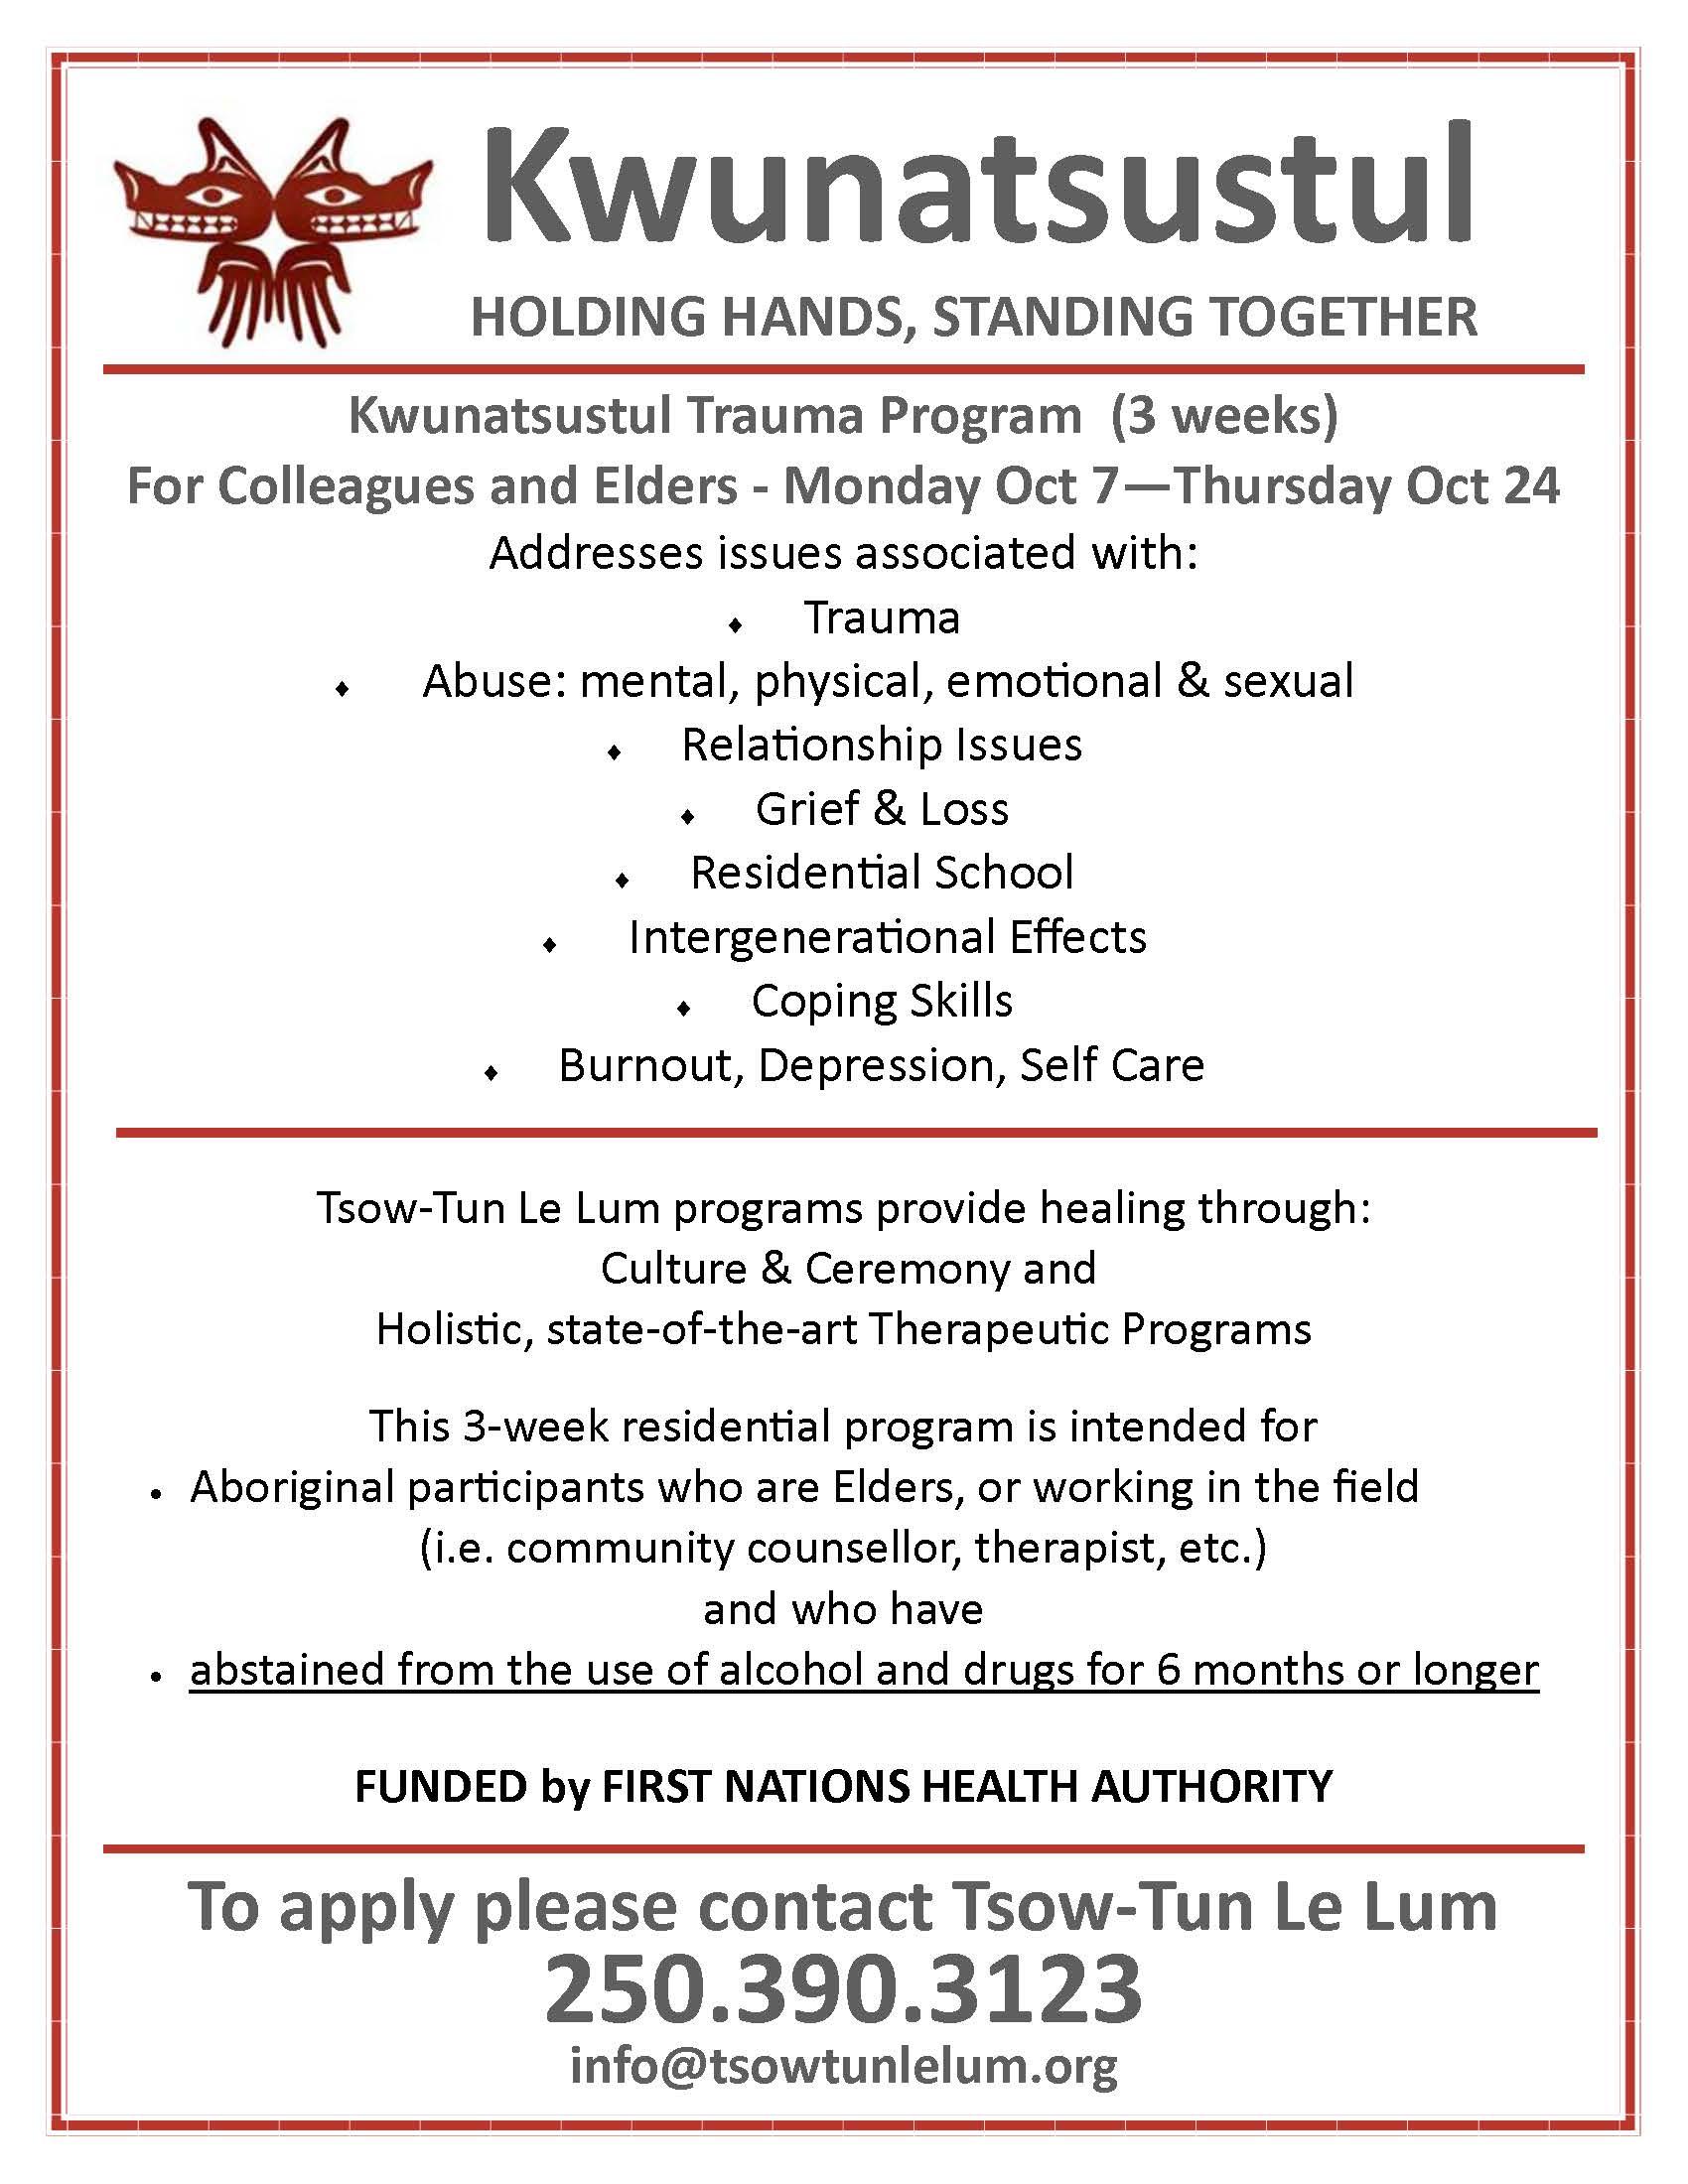 Trauma Program for Colleagues & Elders - October 2019